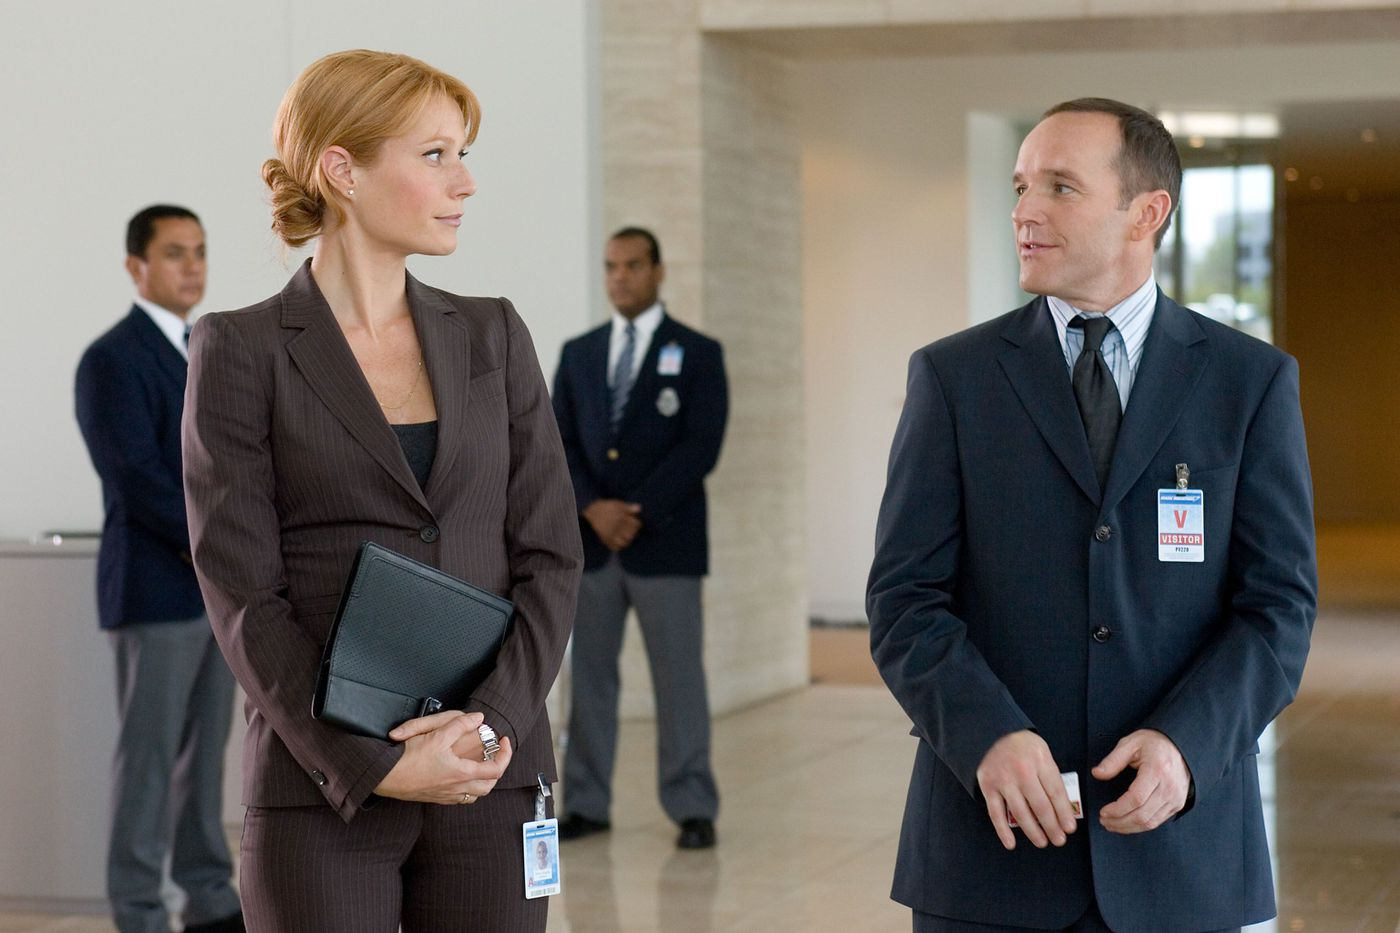 Is Coulson a Skrull? Clark Gregg on MCU rumors, Captain Marvel, & more -  Polygon